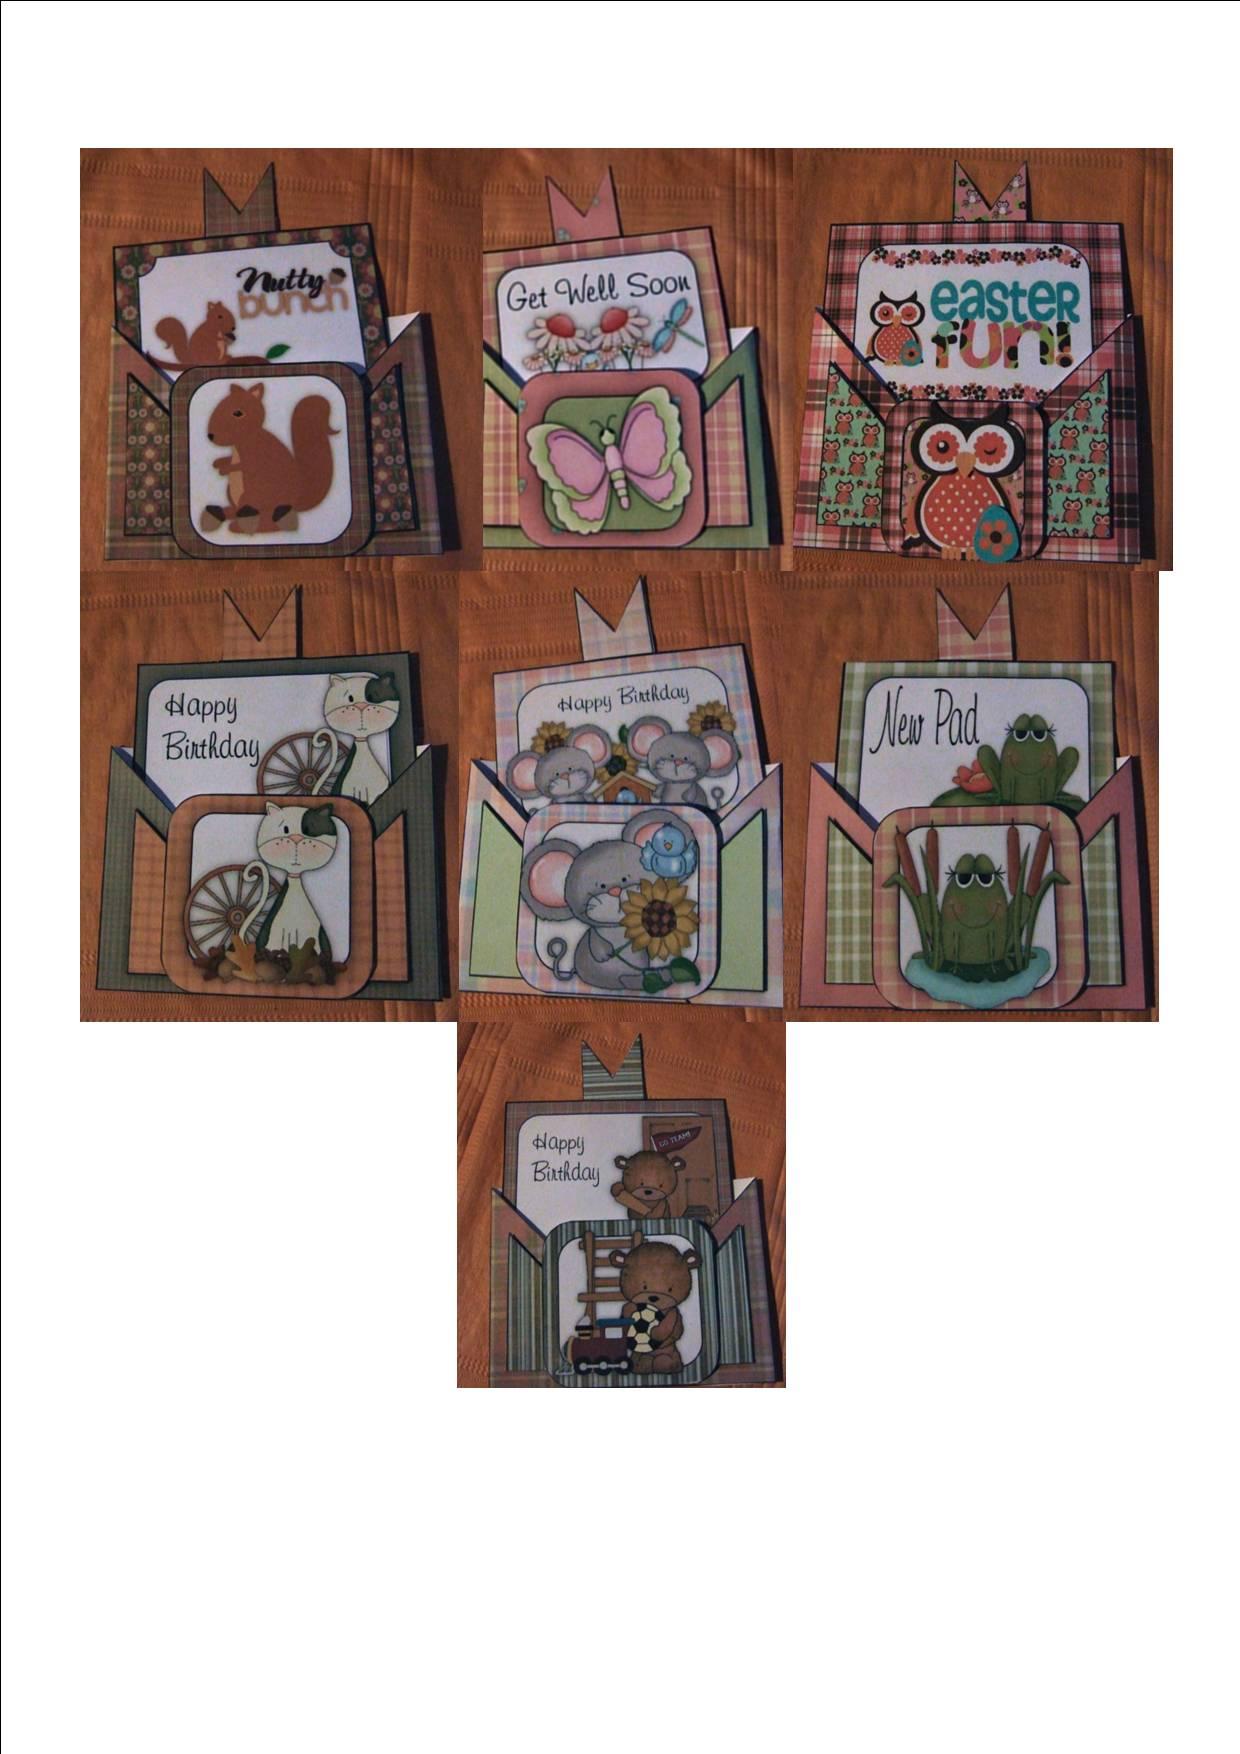 Criss cross pocket hedgehog birthday card cup308678 1416 for Cross in my pocket craft